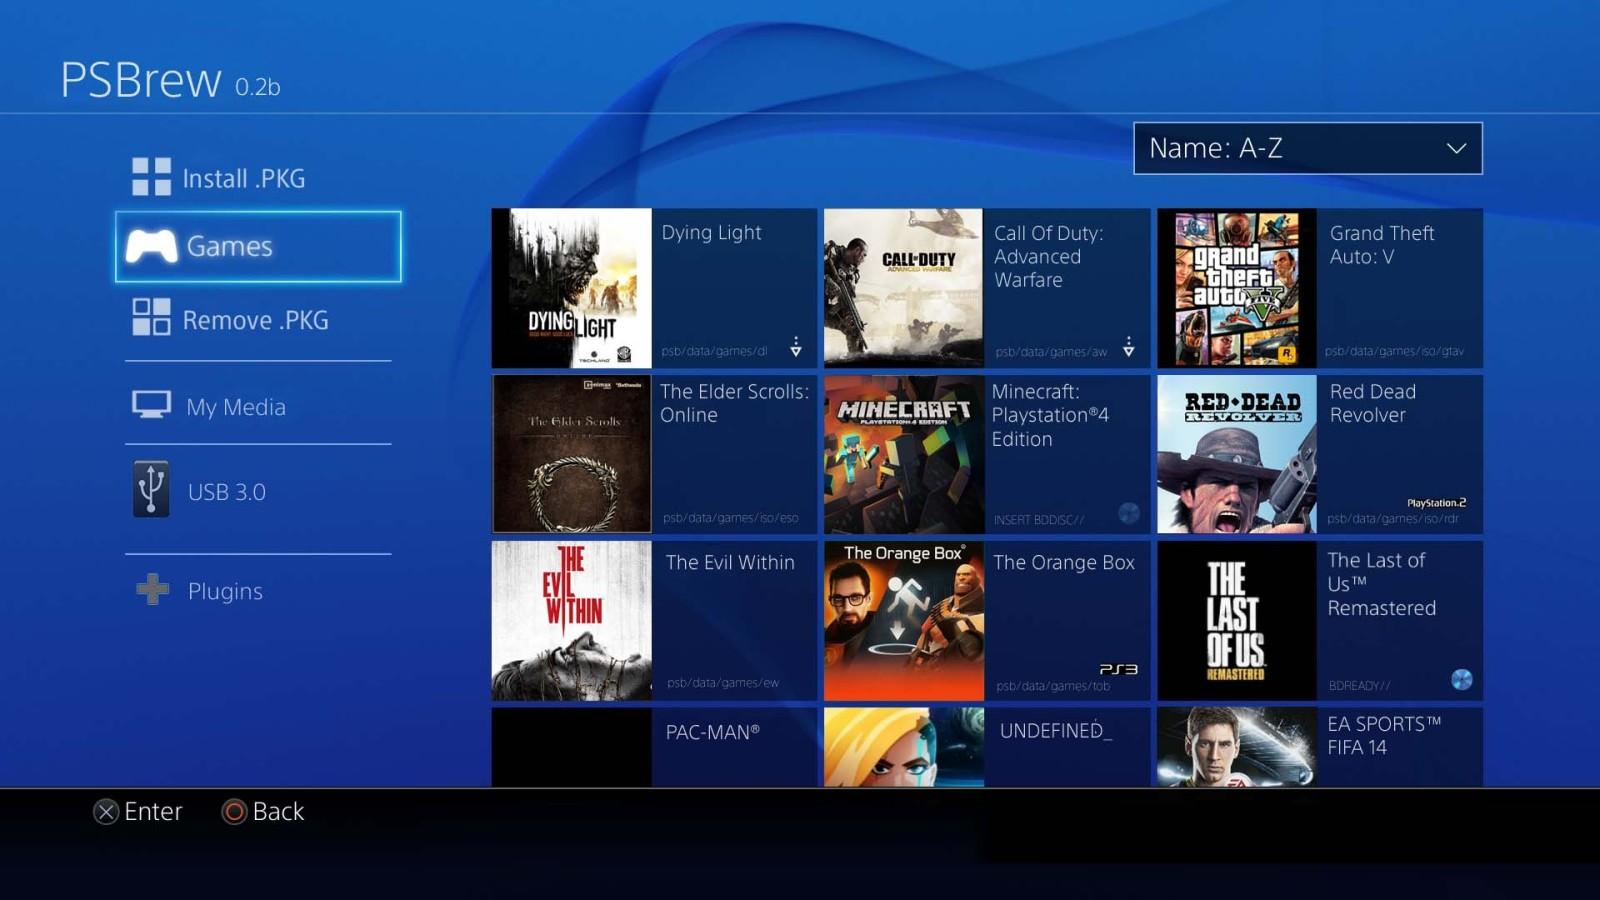 Consoles Underground - Jailbreak - CFW - OFW: PS4 Jailbreak